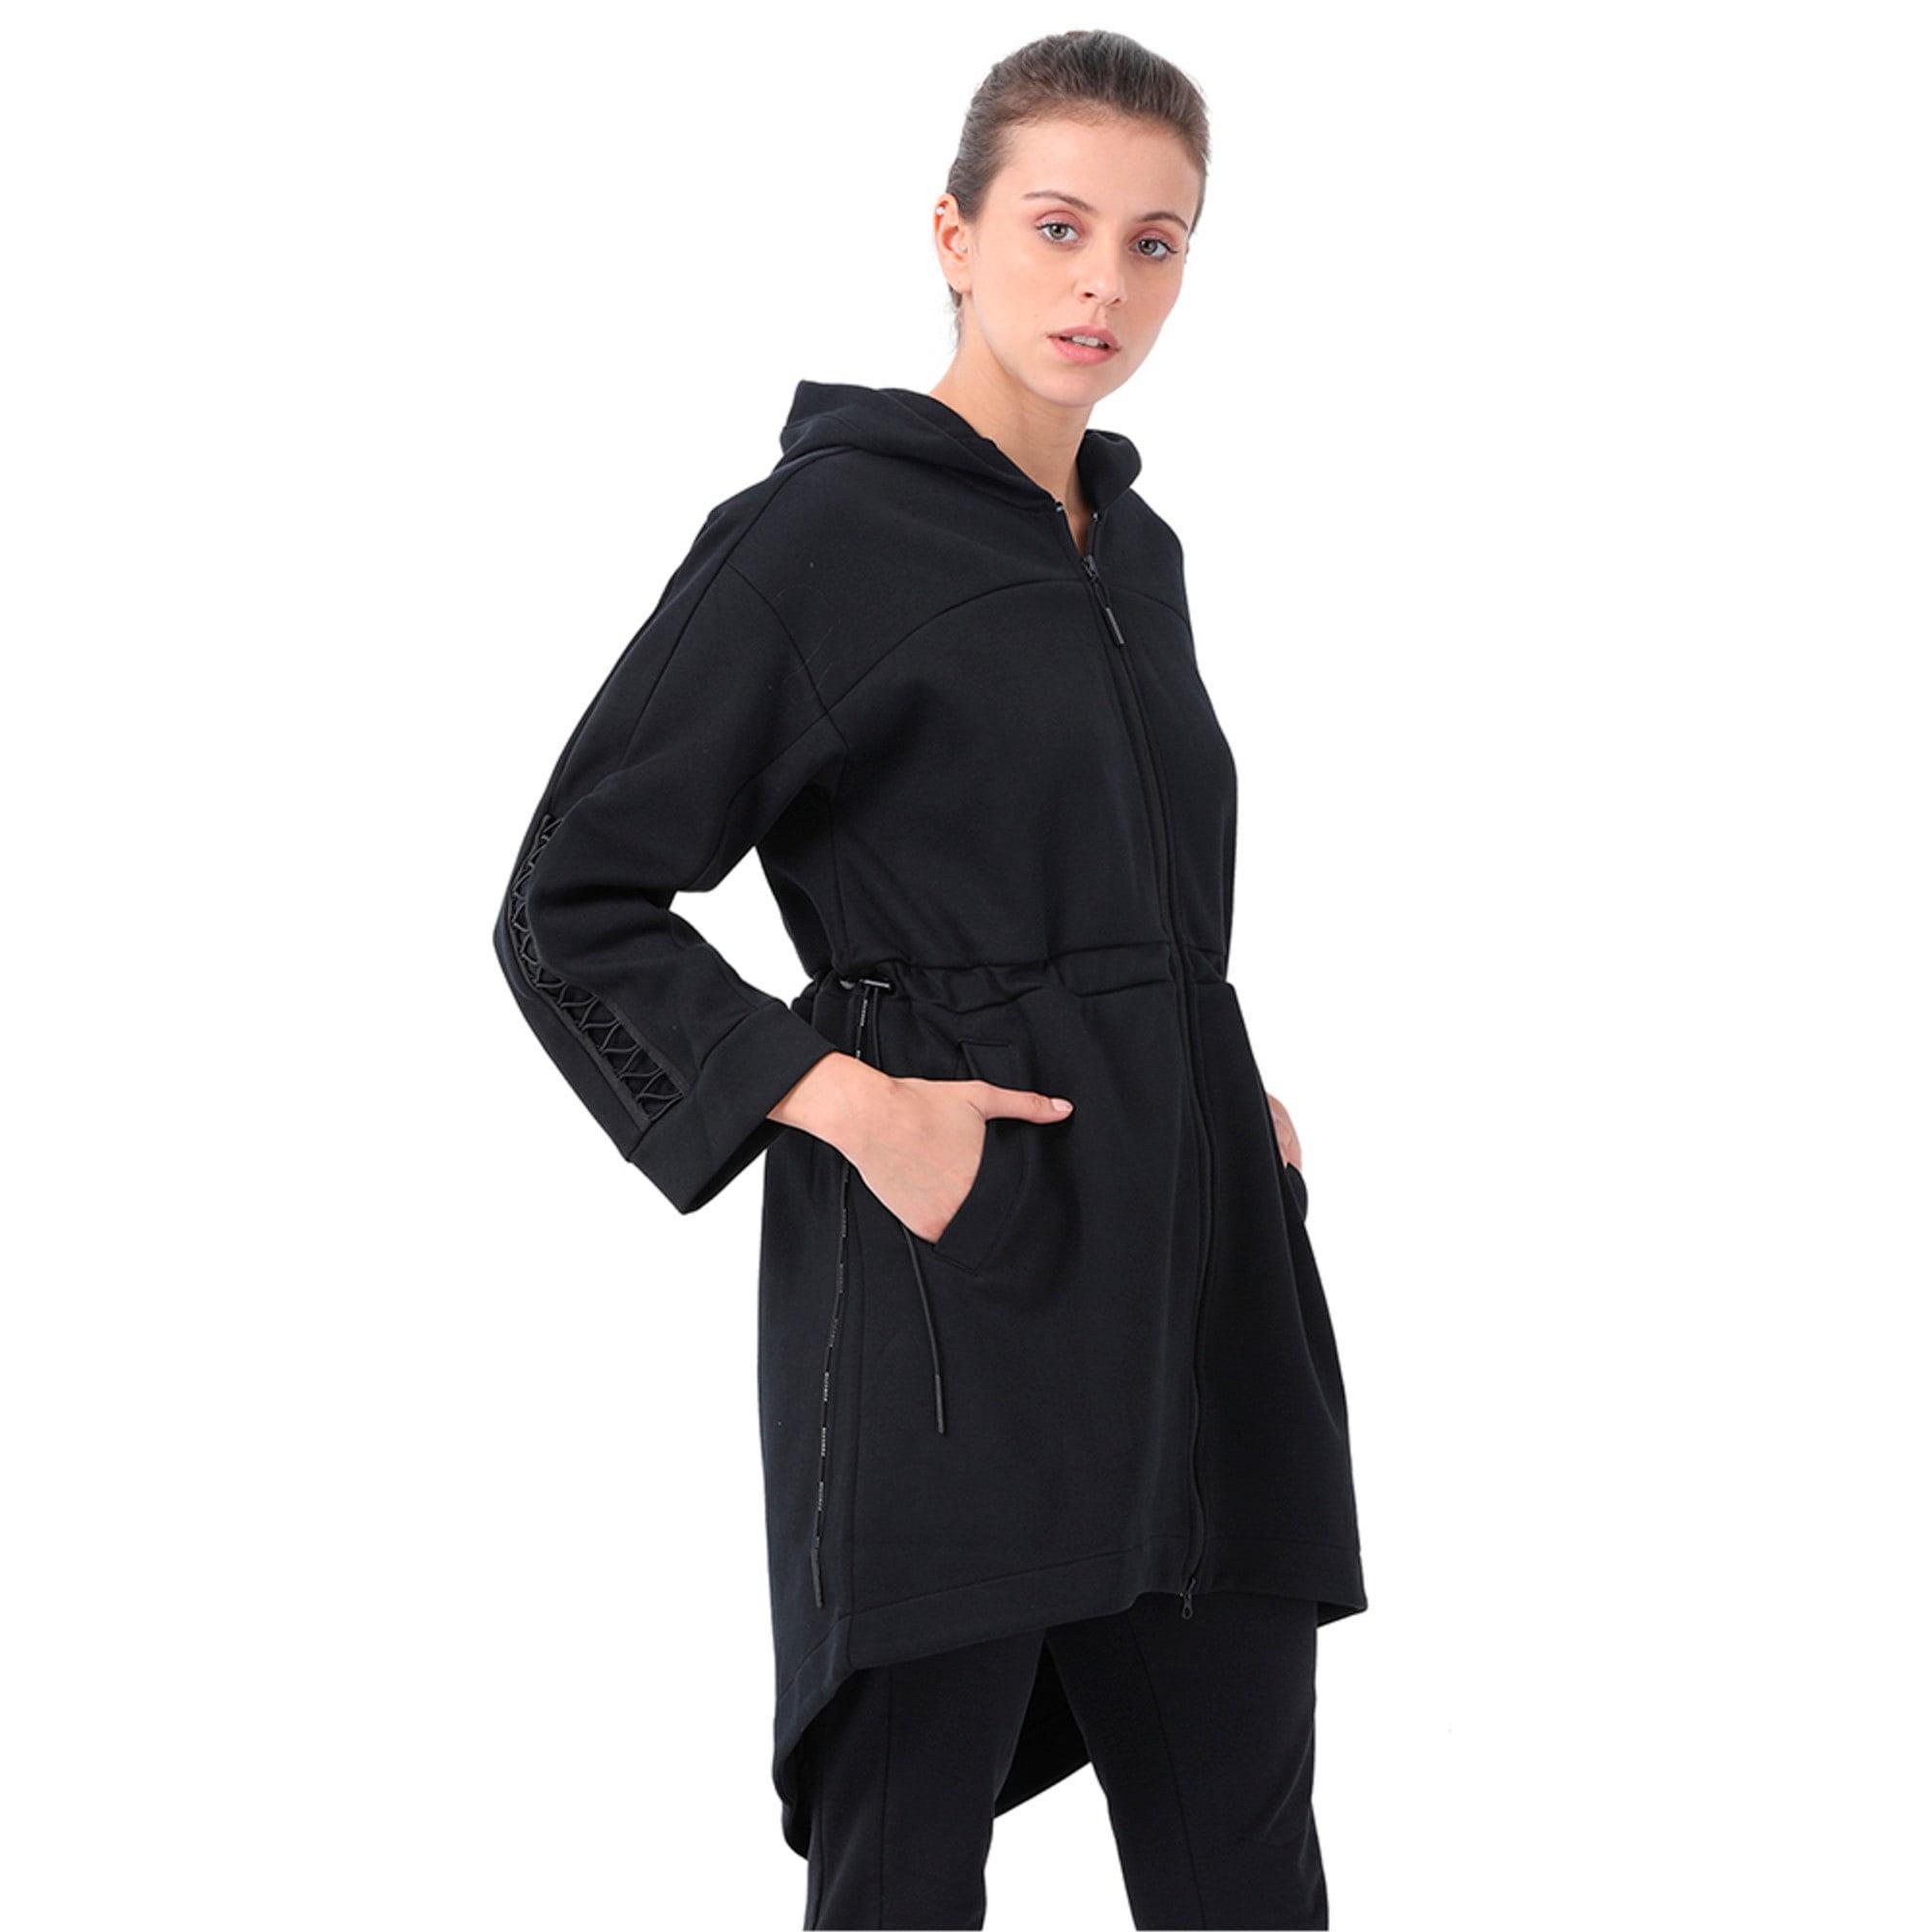 Thumbnail 1 of Evolution Women's Lacing Midlayer Jacket, Puma Black, medium-IND